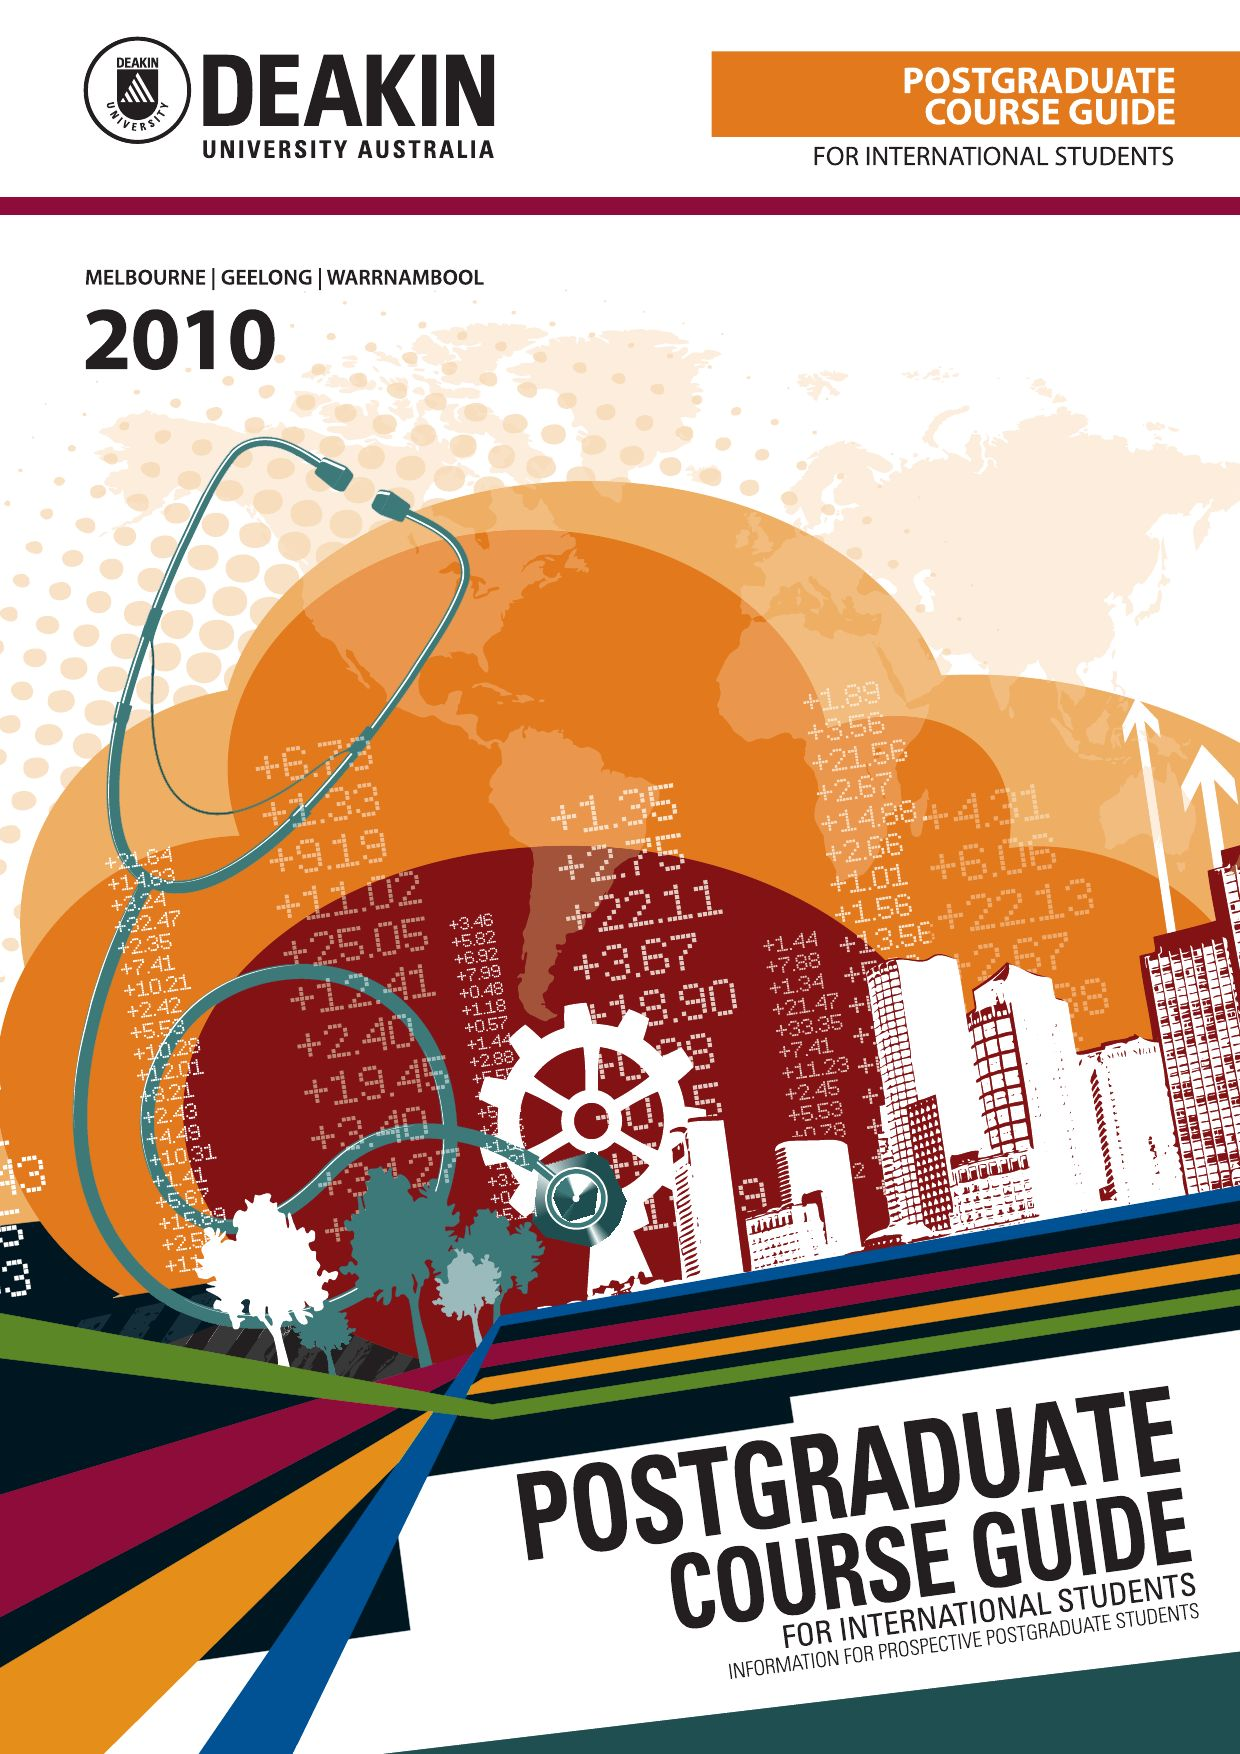 deakin university application form for international students